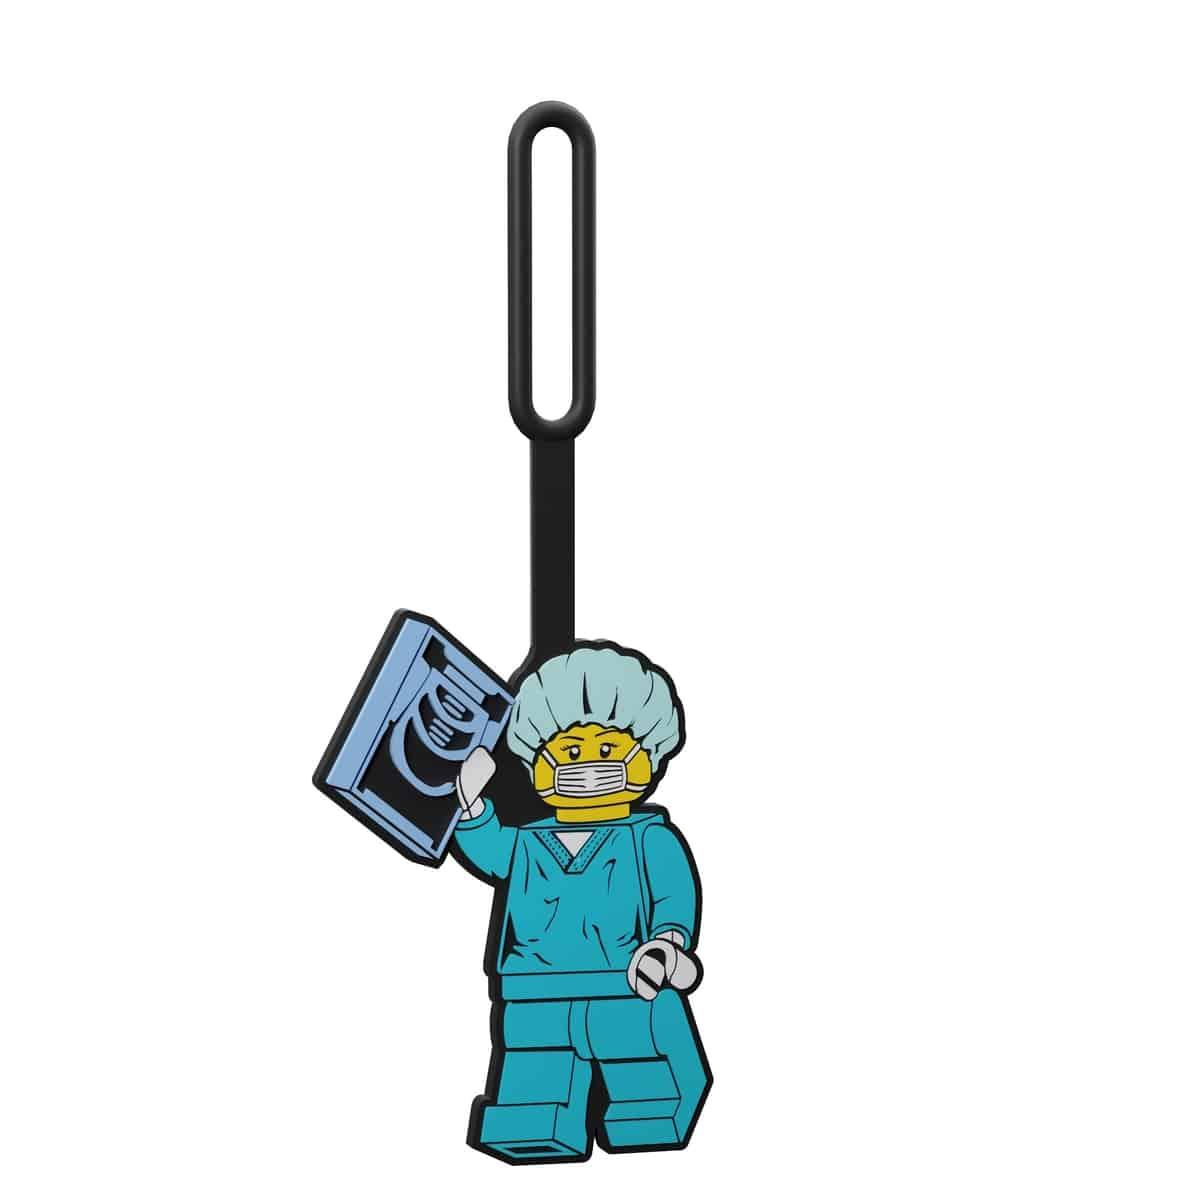 lego 5006376 kirurg taskevedhaeng